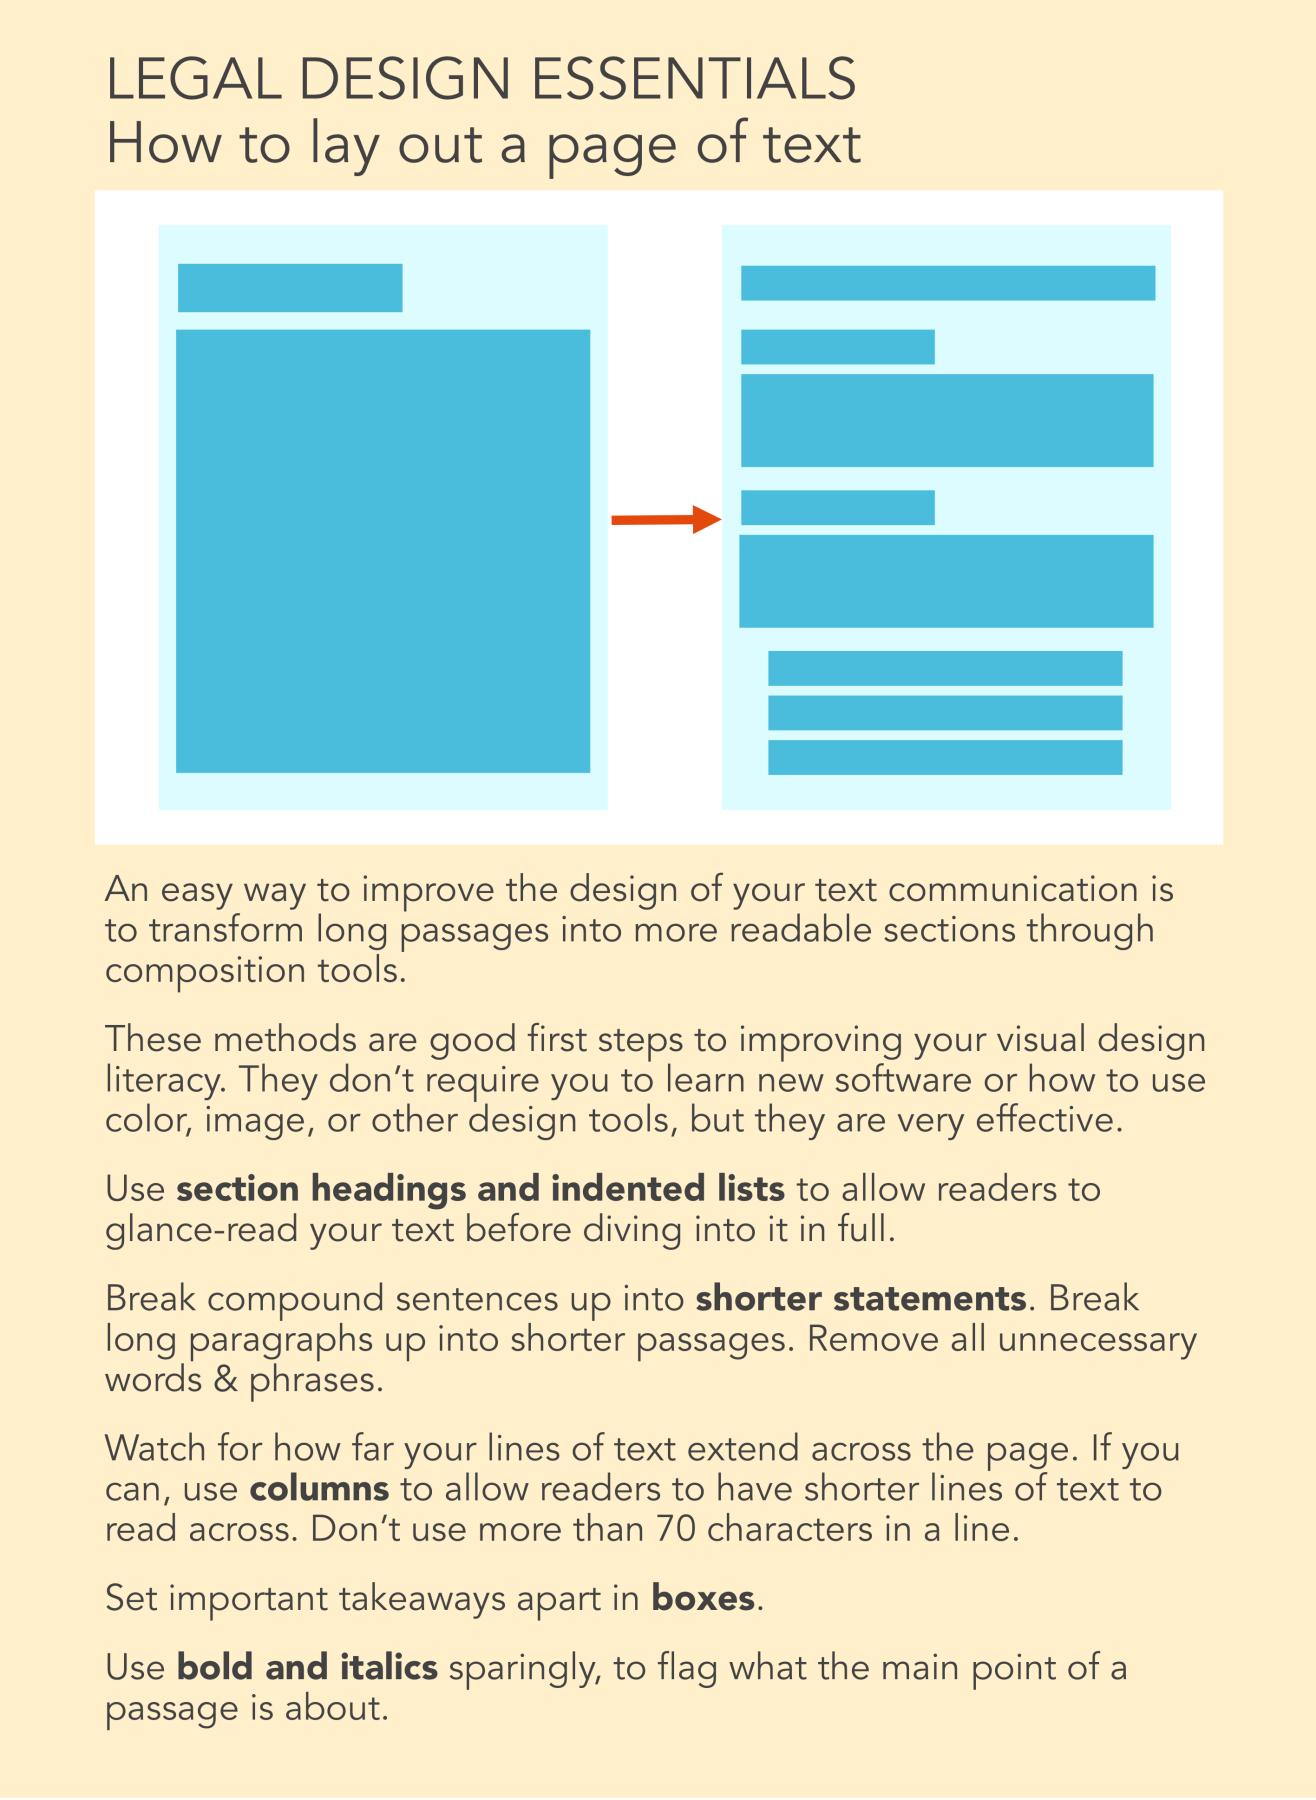 Legal Communication Design Toolbox   Legal Design Toolbox